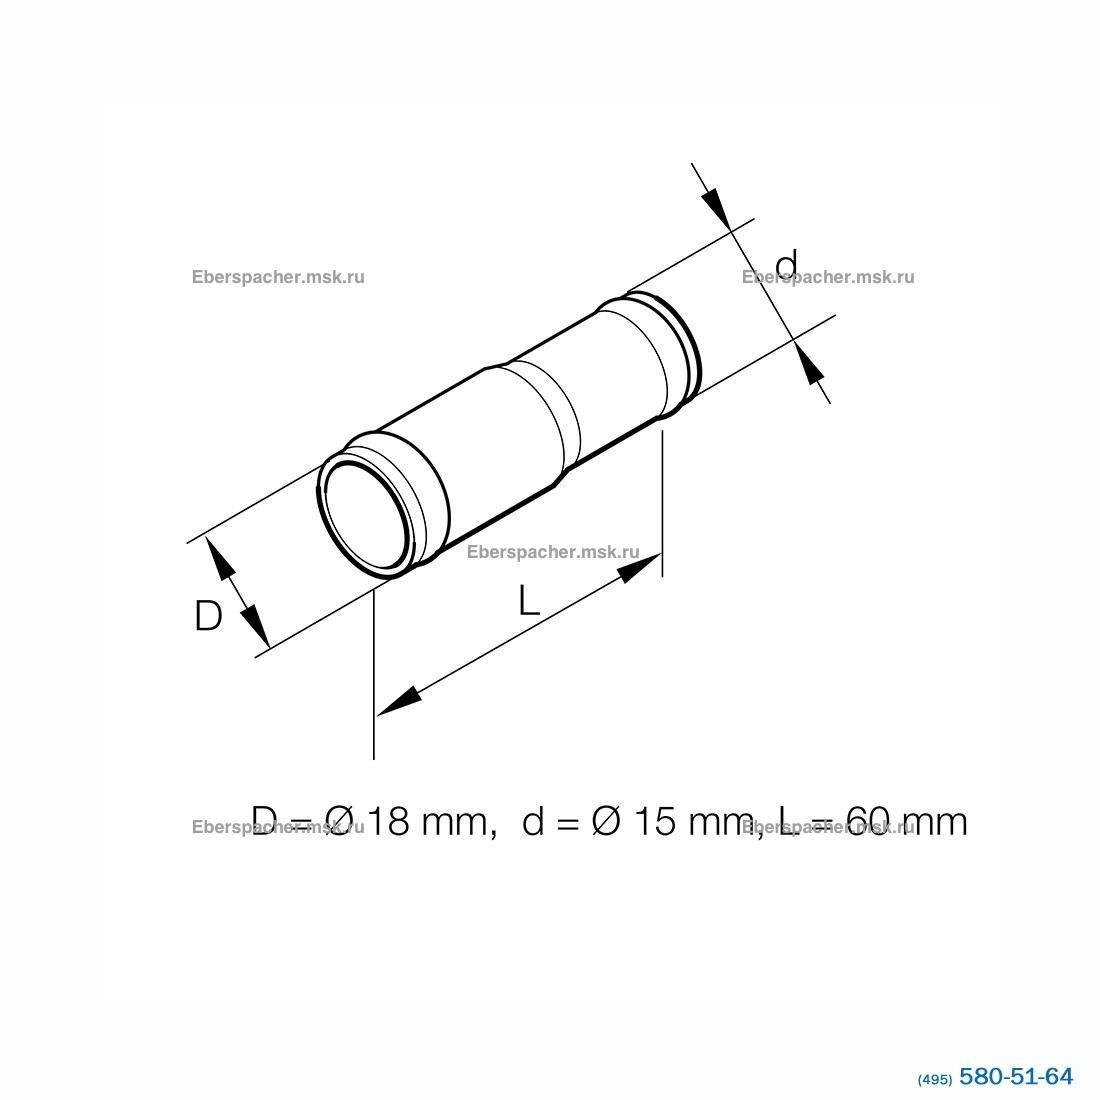 Переходник латунный 18/15 мм | Артикул: 201645800201